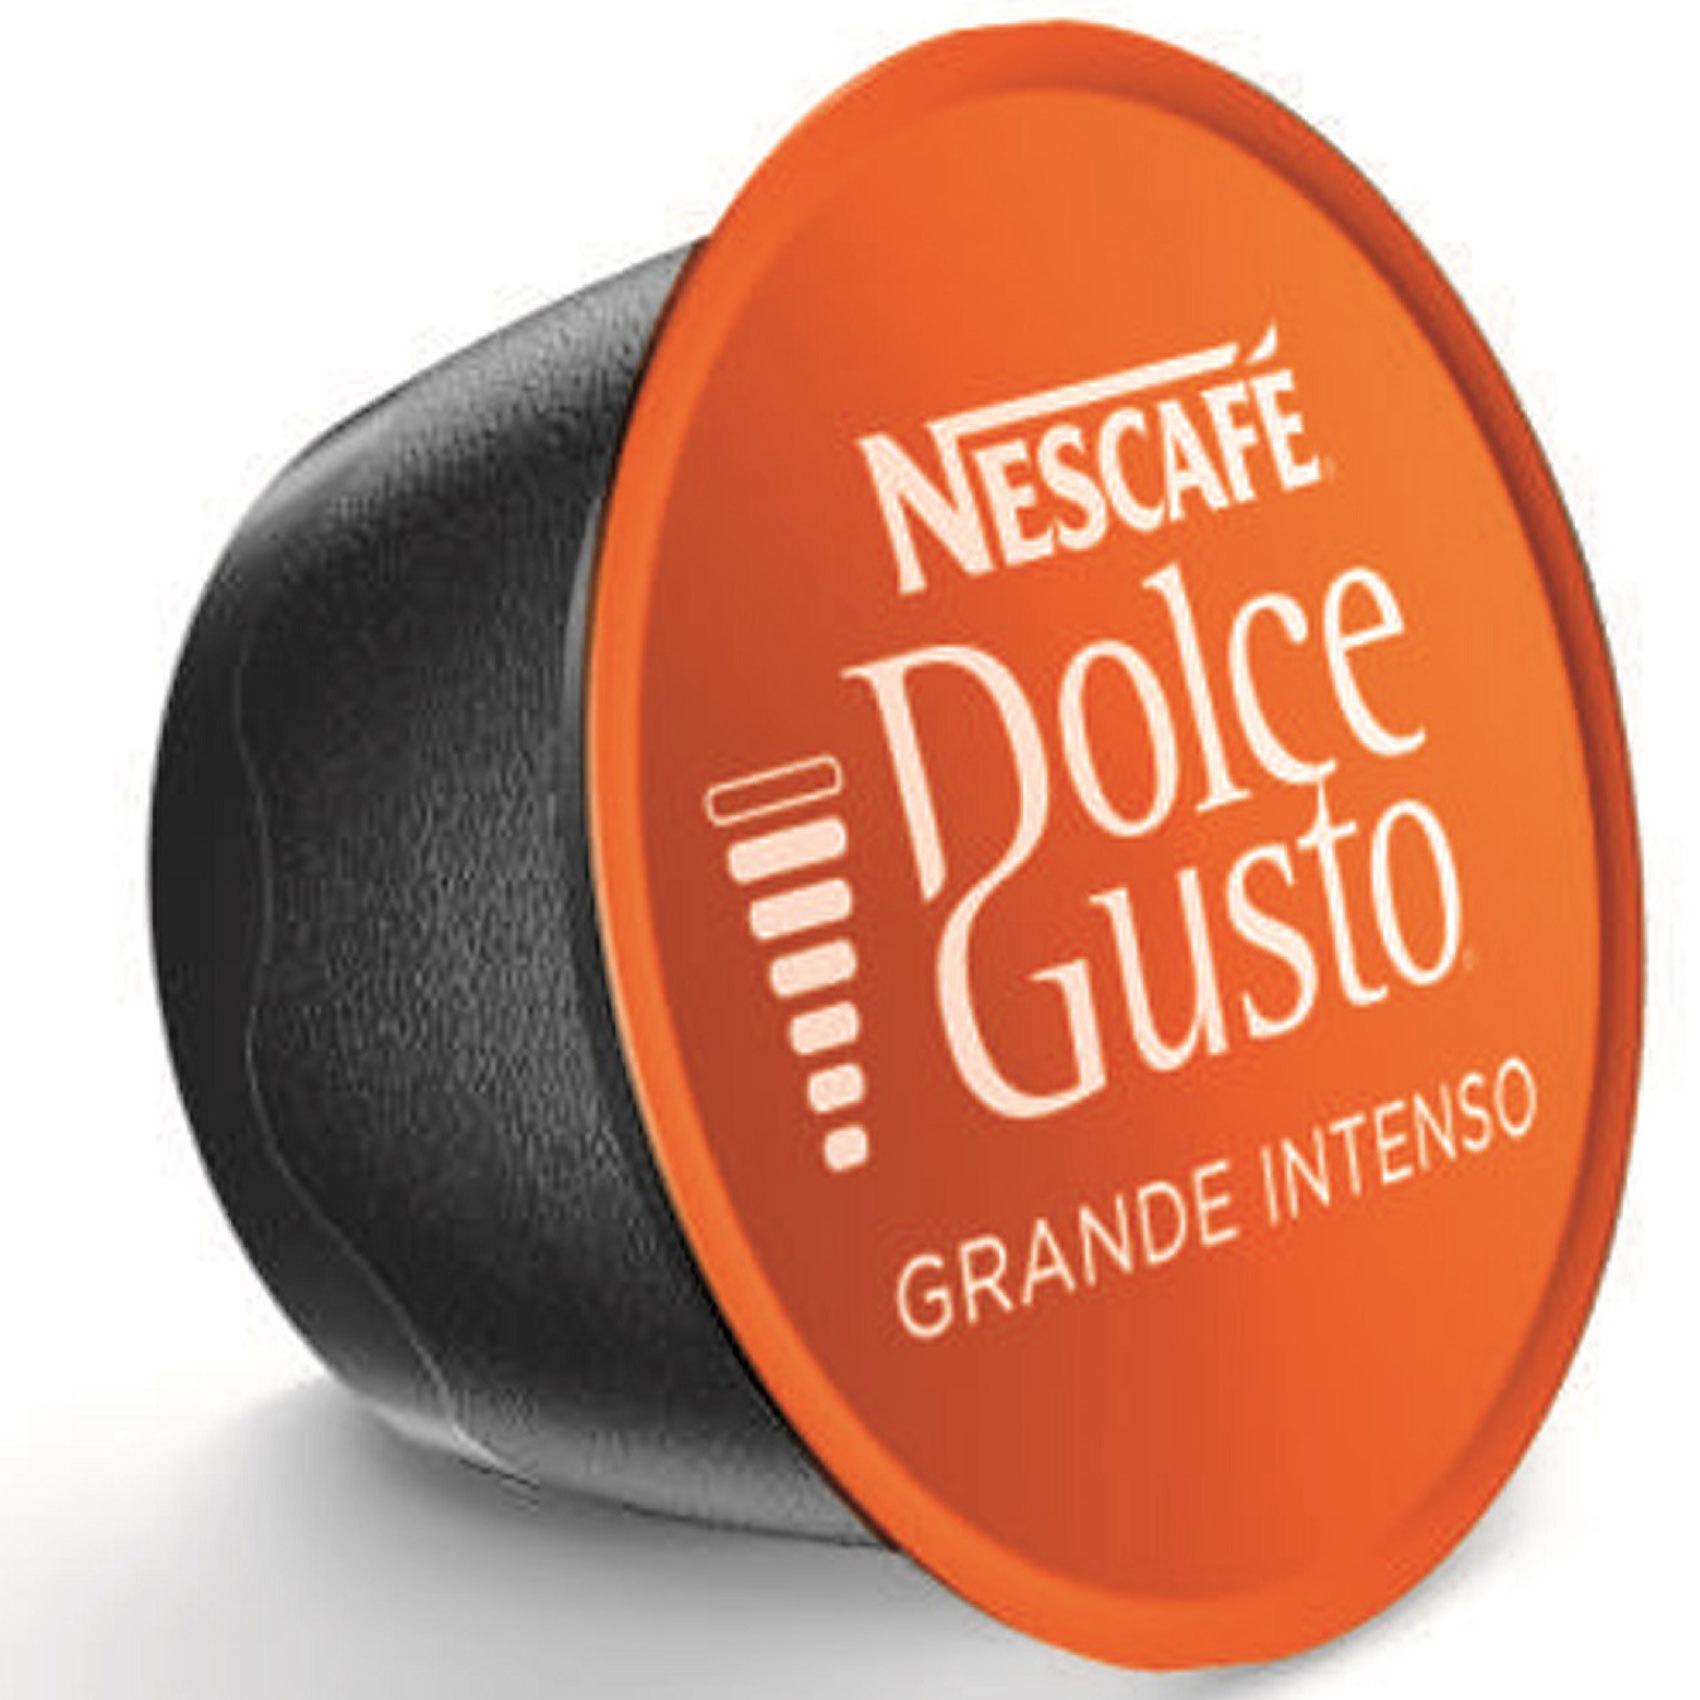 NESCAFE DOLCE GUSTO GNDE INTEN 160G